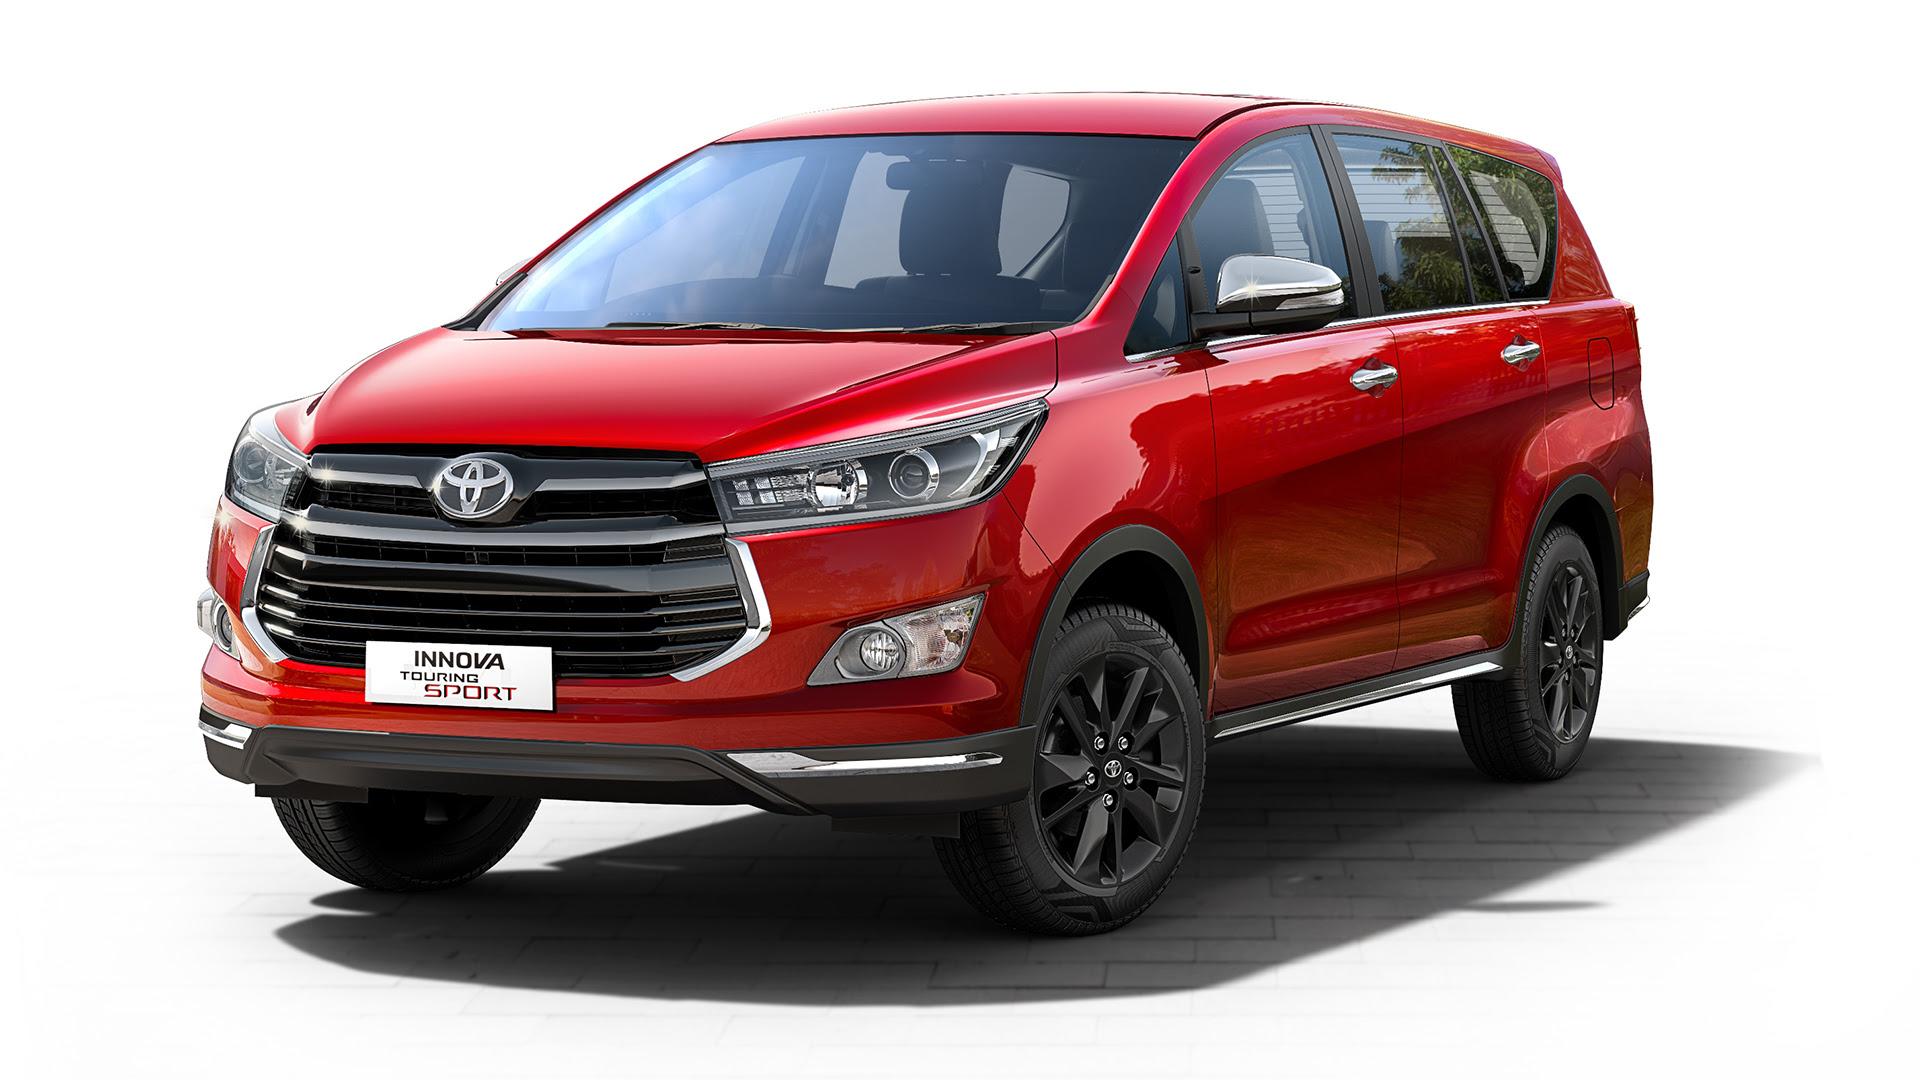 Price Of 2016 Toyota Innova Philippines | 2017 / 2018 Cars ...